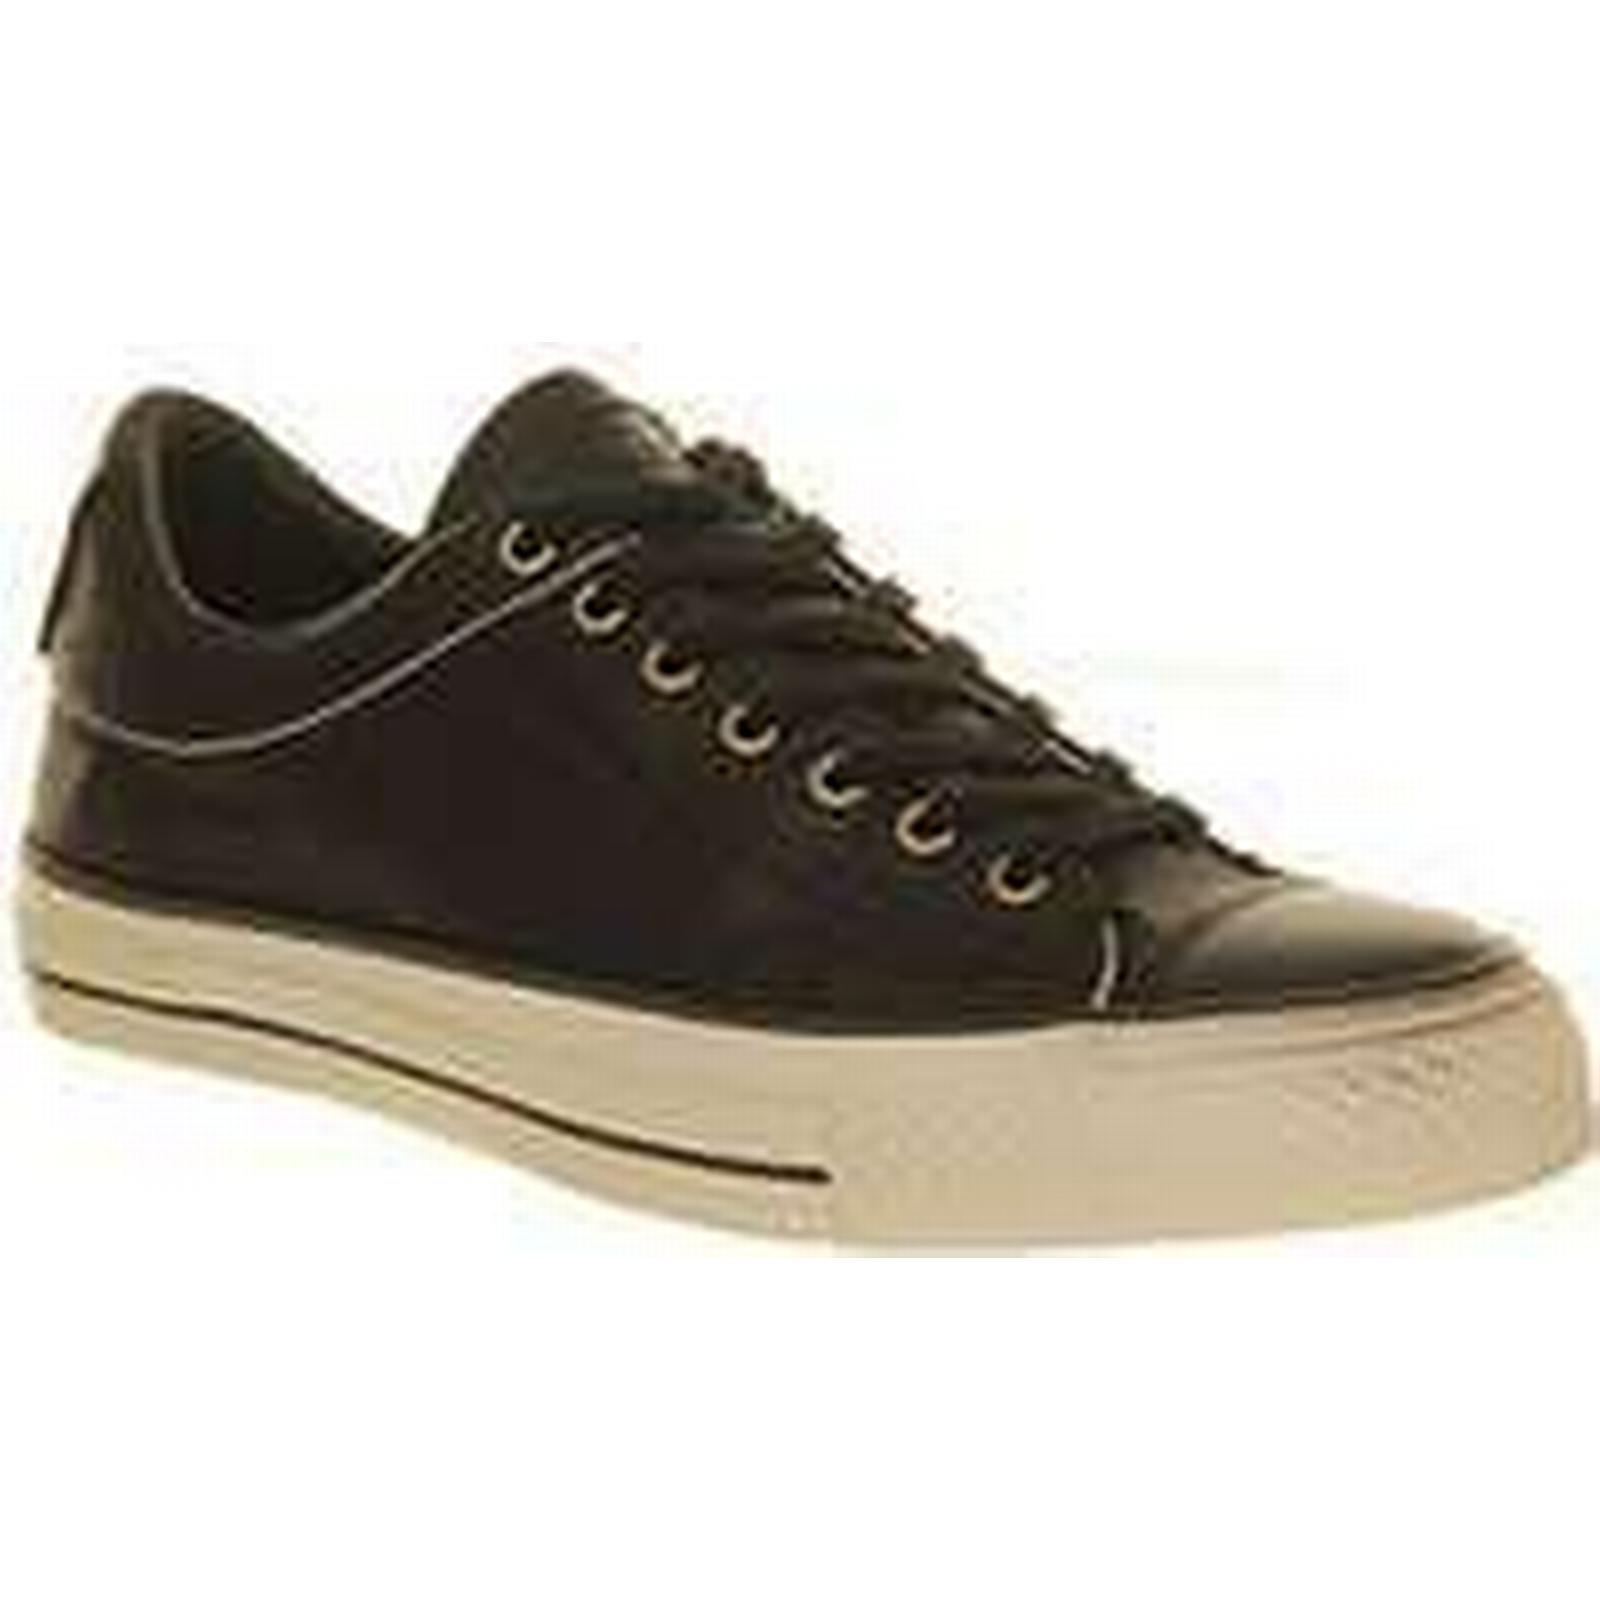 Converse John Star Varvatos John Varvatos All Star John Ox Leather BLACK,Olive Green,Black 3802f6